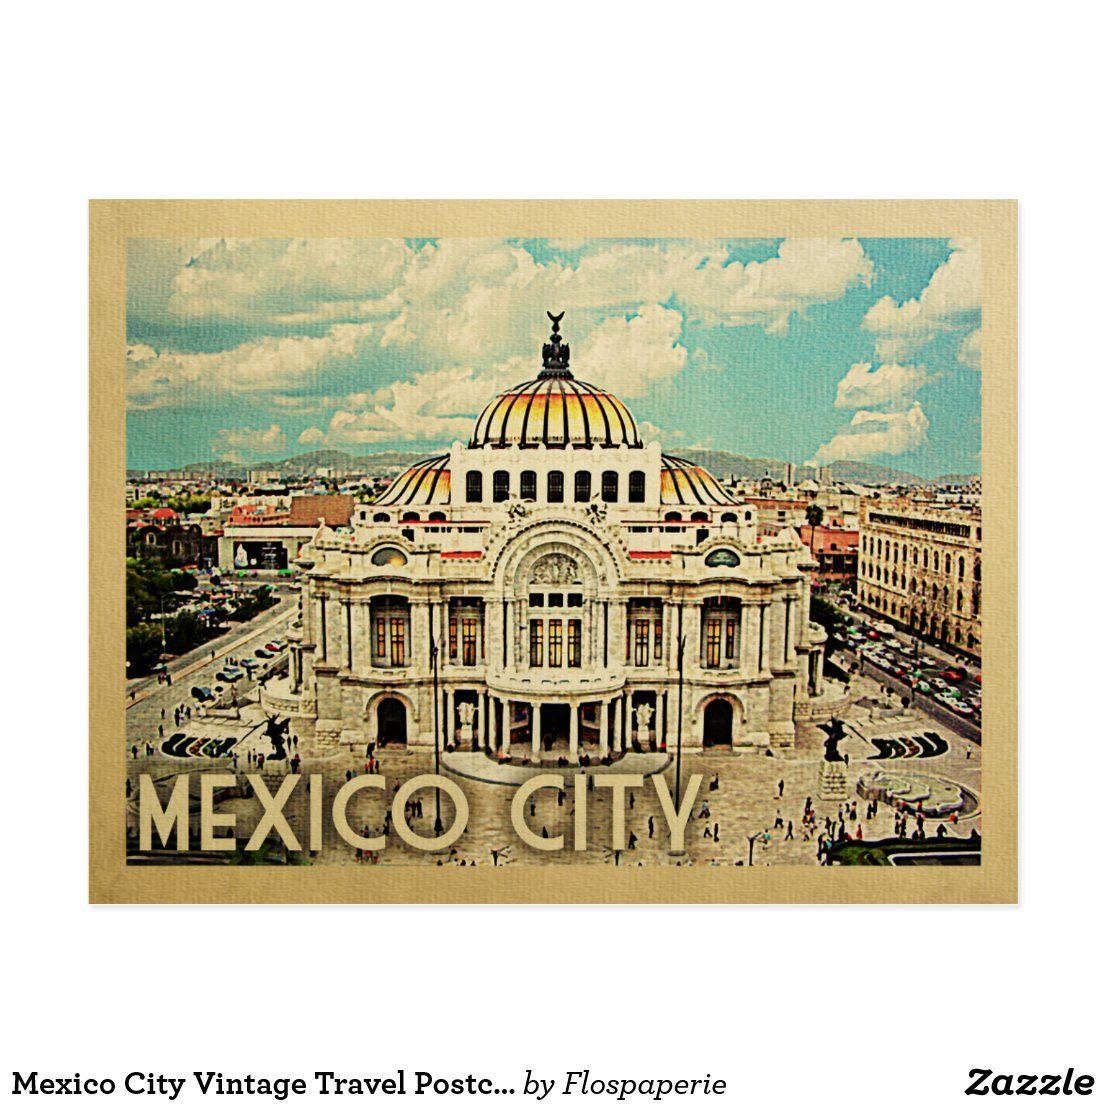 Mexico City Vintage Travel Postcard Zazzle Com In 2020 Vintage Postcards Travel Travel Postcard Vintage Travel Posters